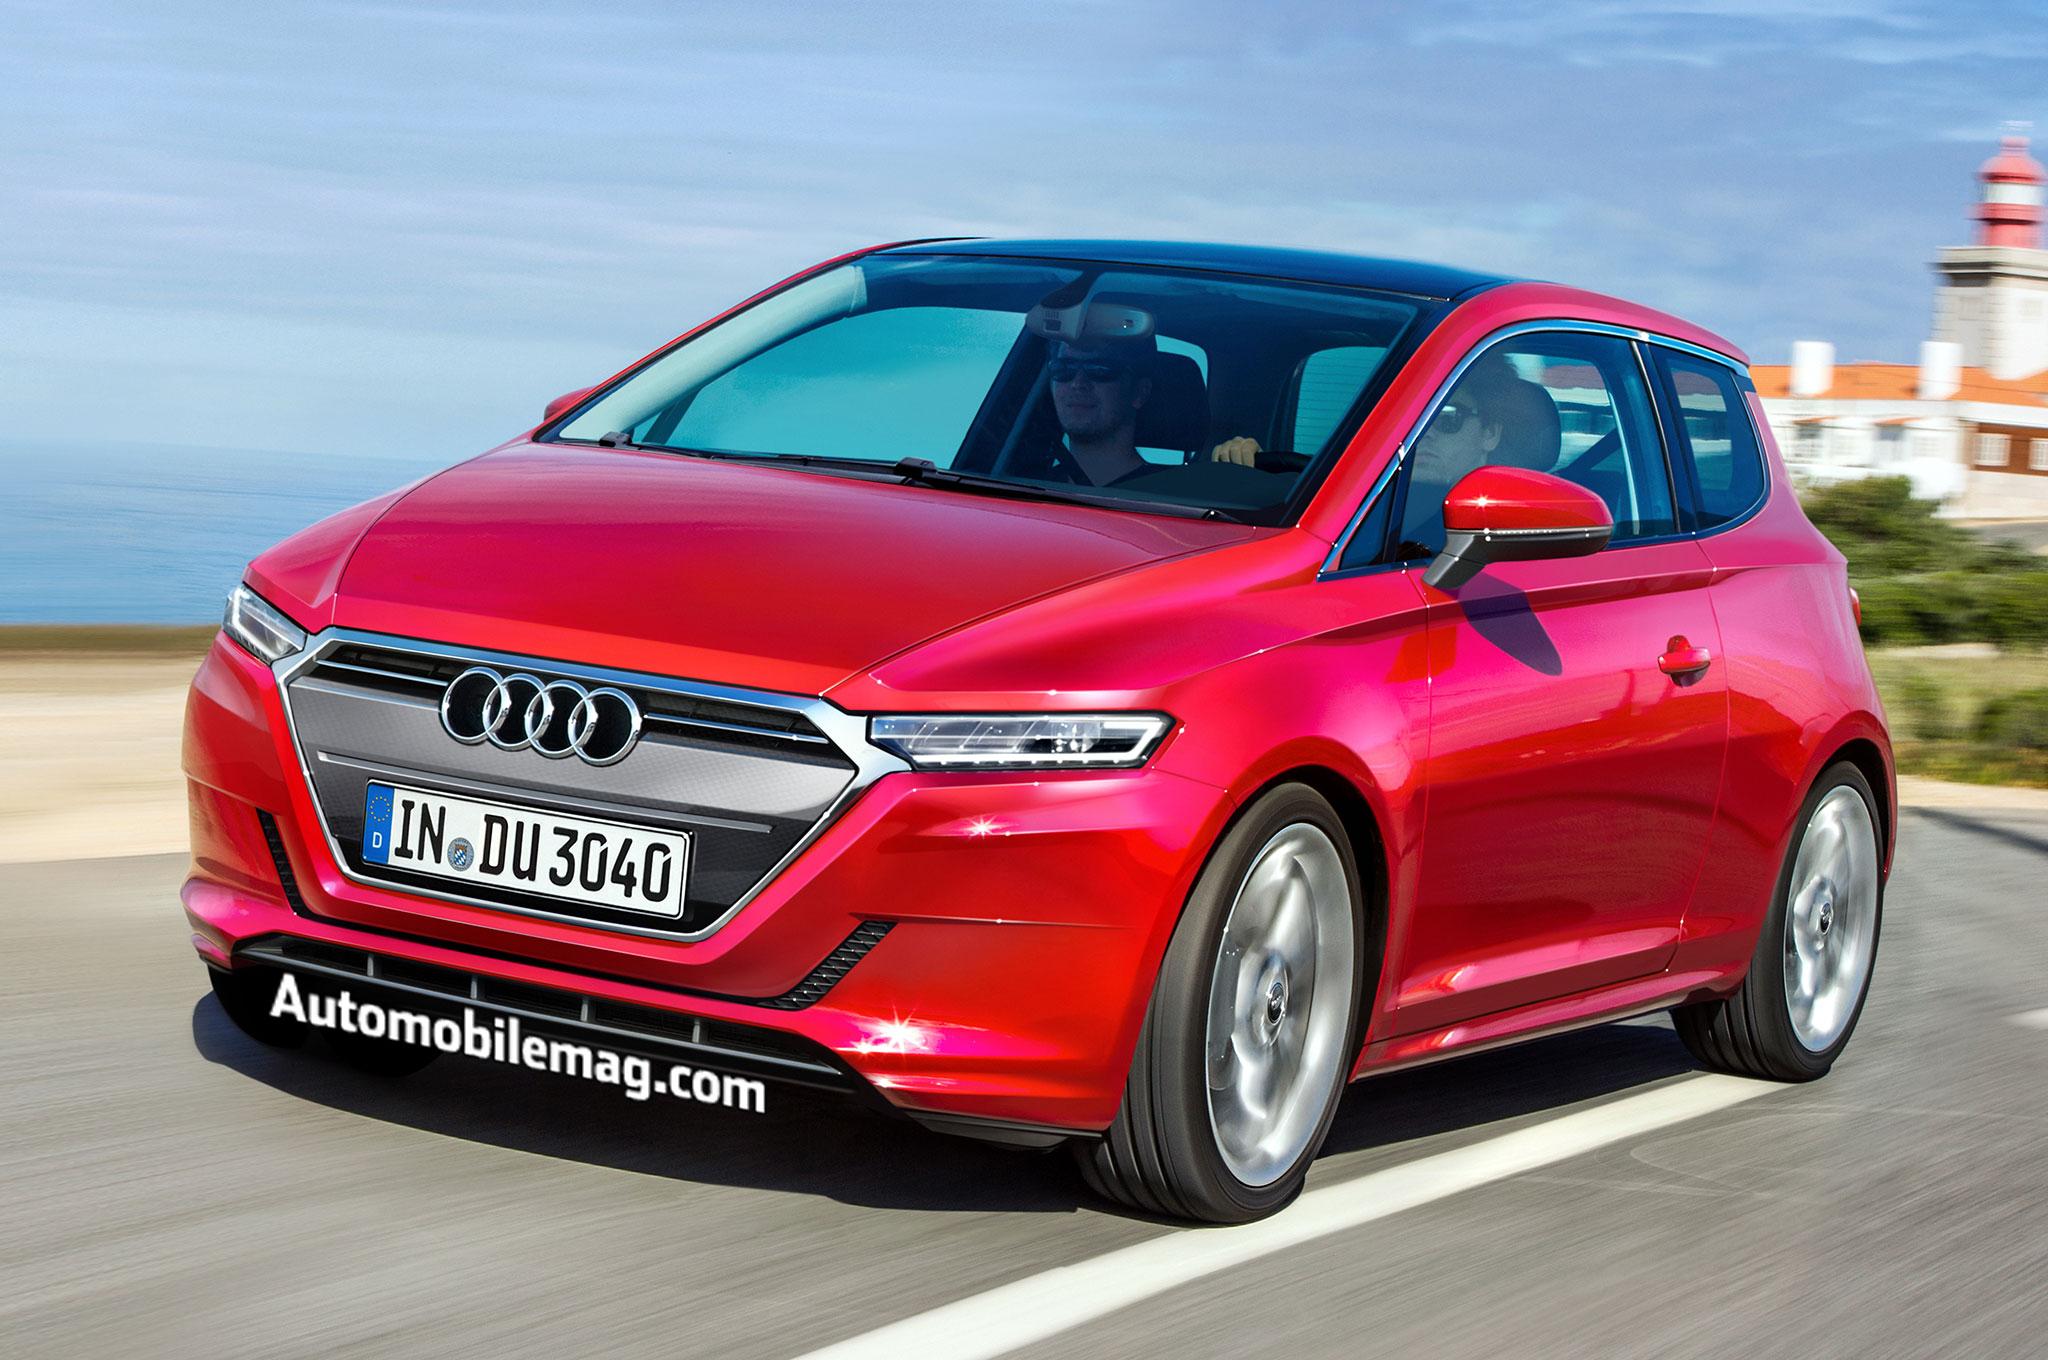 A1 Auto Sales >> Deep Dive: An All-New, Ultra-Compact Audi City Car